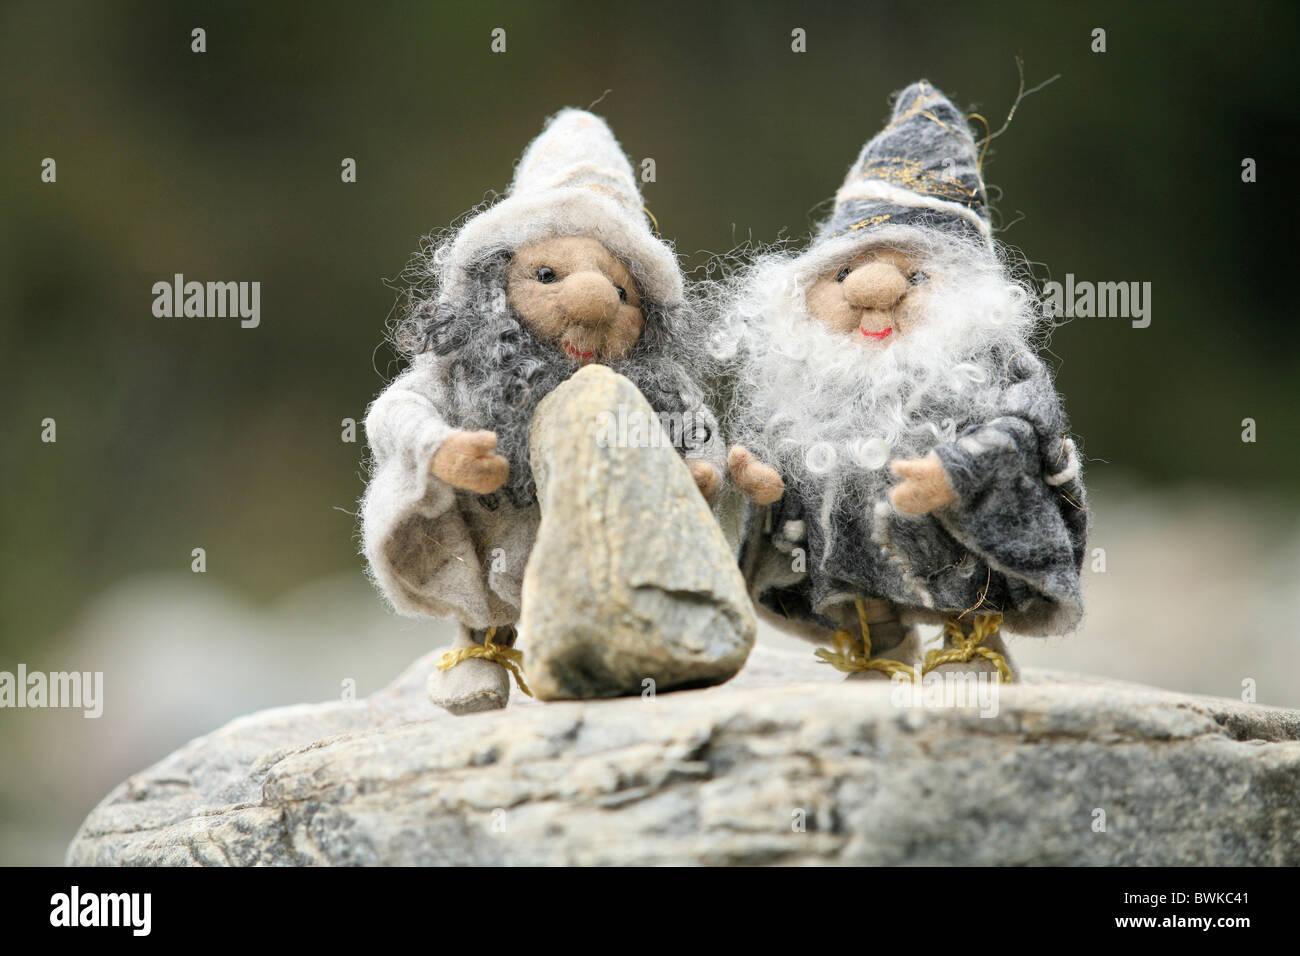 Gnome midget oklahoma